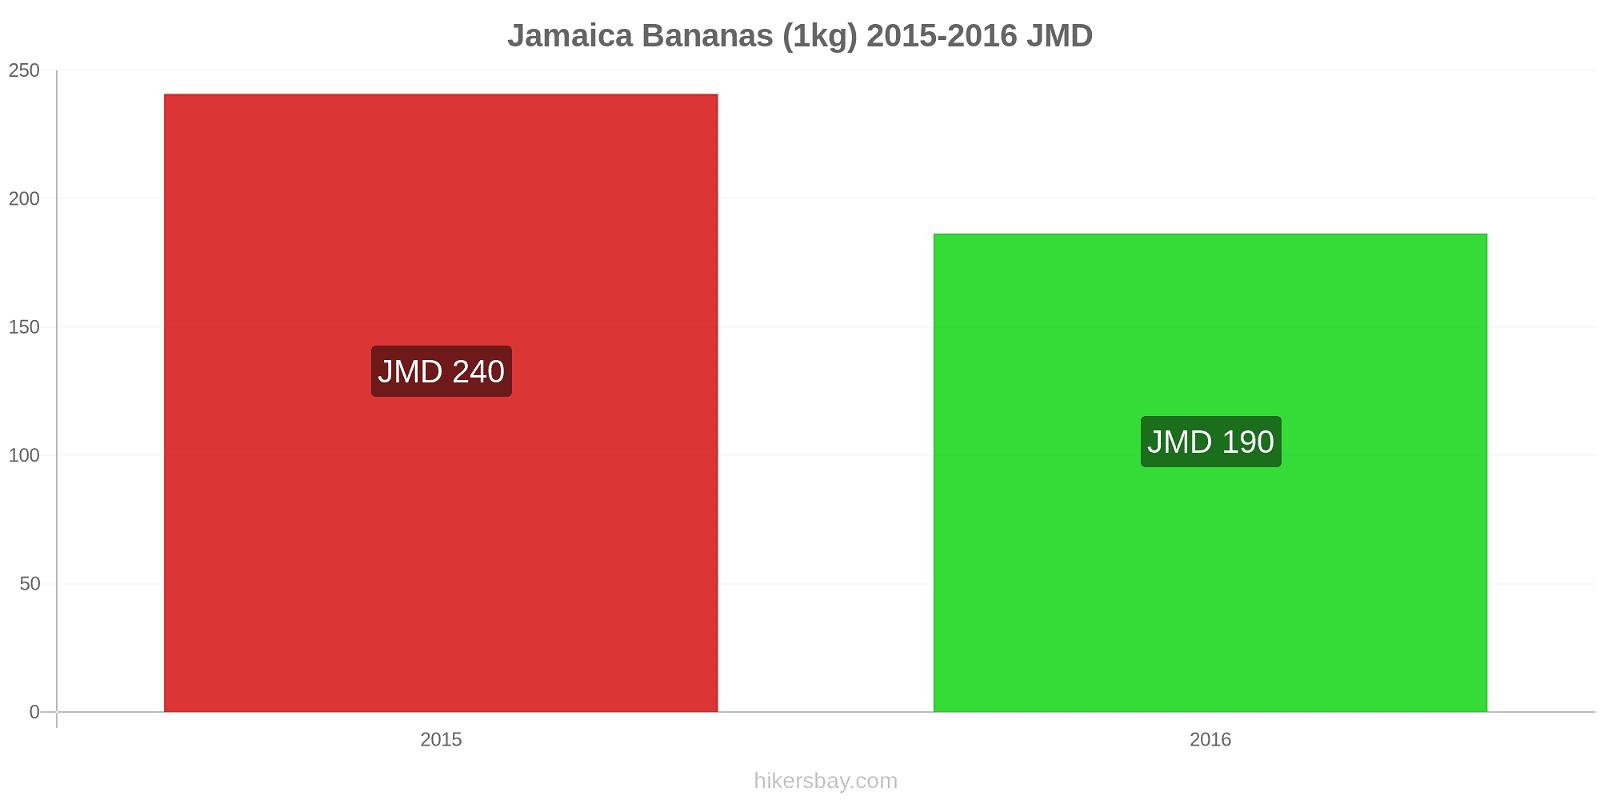 Jamaica price changes Bananas (1kg) hikersbay.com